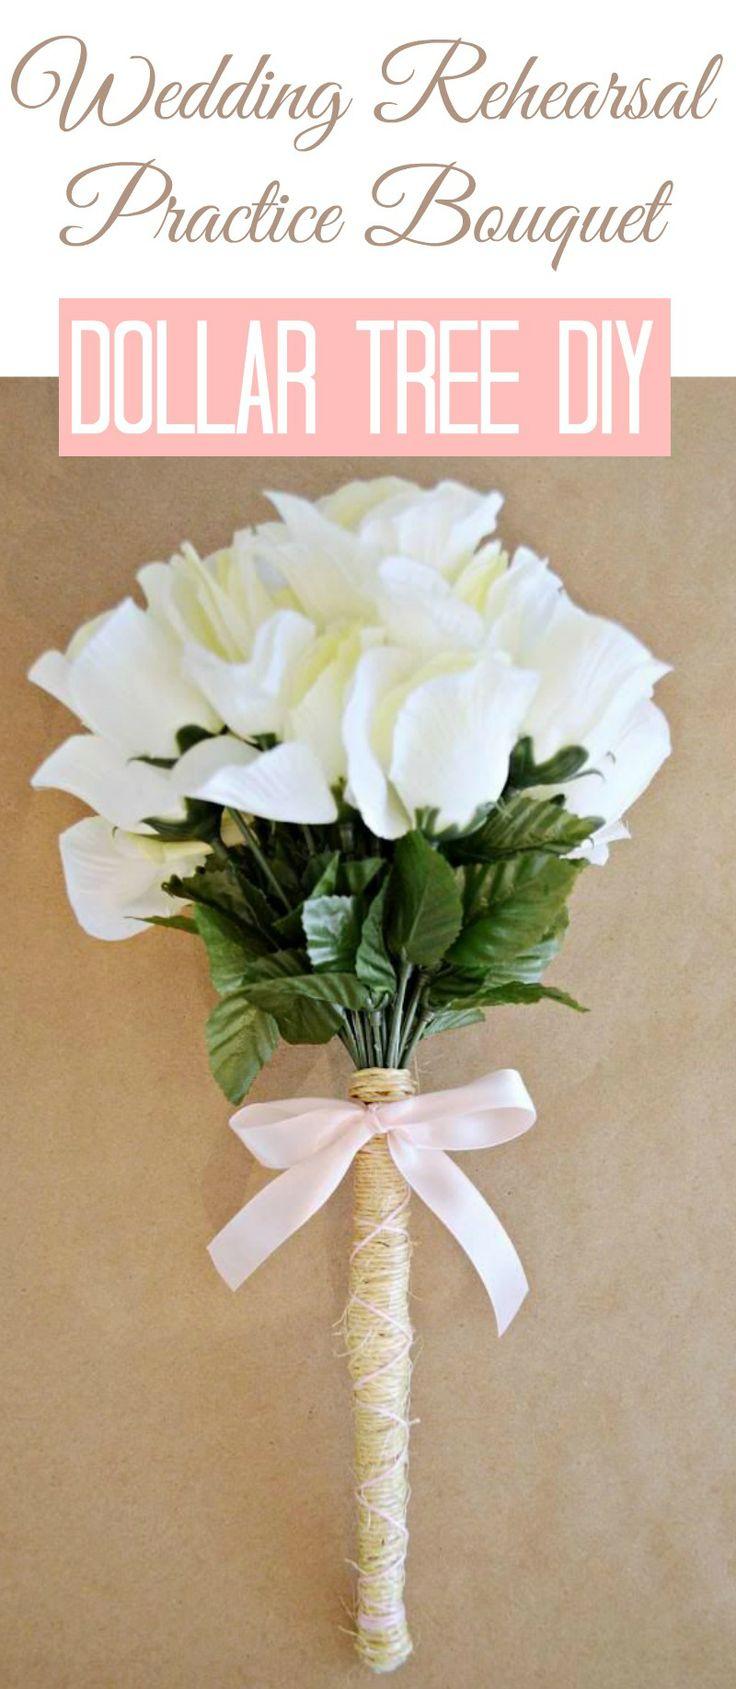 Wedding Idea: Diy Practice Rehearsal Bouquet with Dollar Tree Flowers #wedding #weddingidea